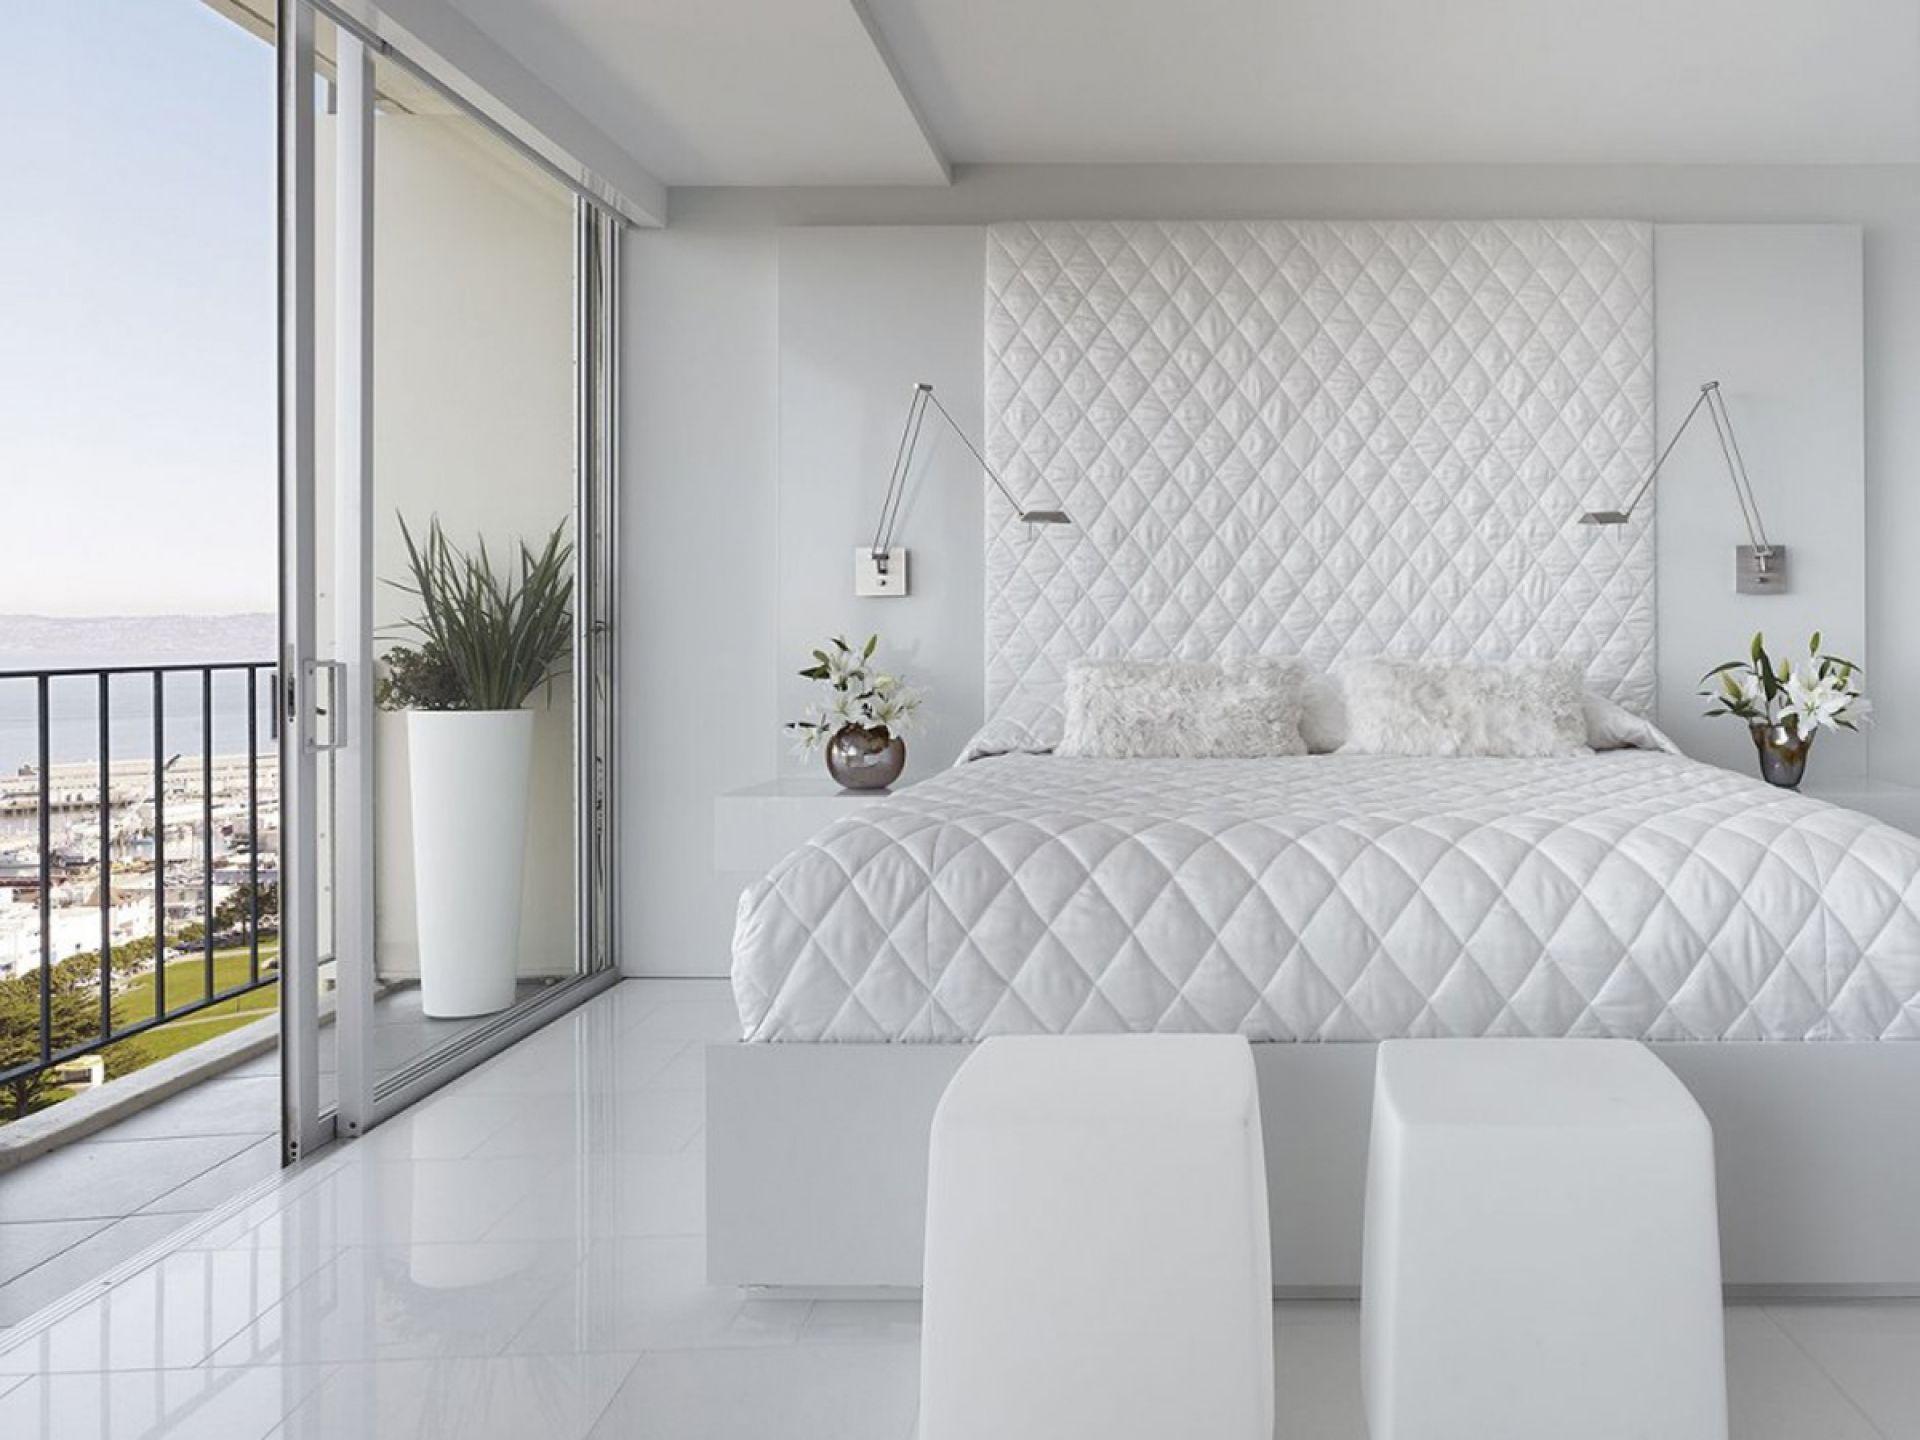 1920x1440 amazing transformative english style bedroom 1200x920 pixel